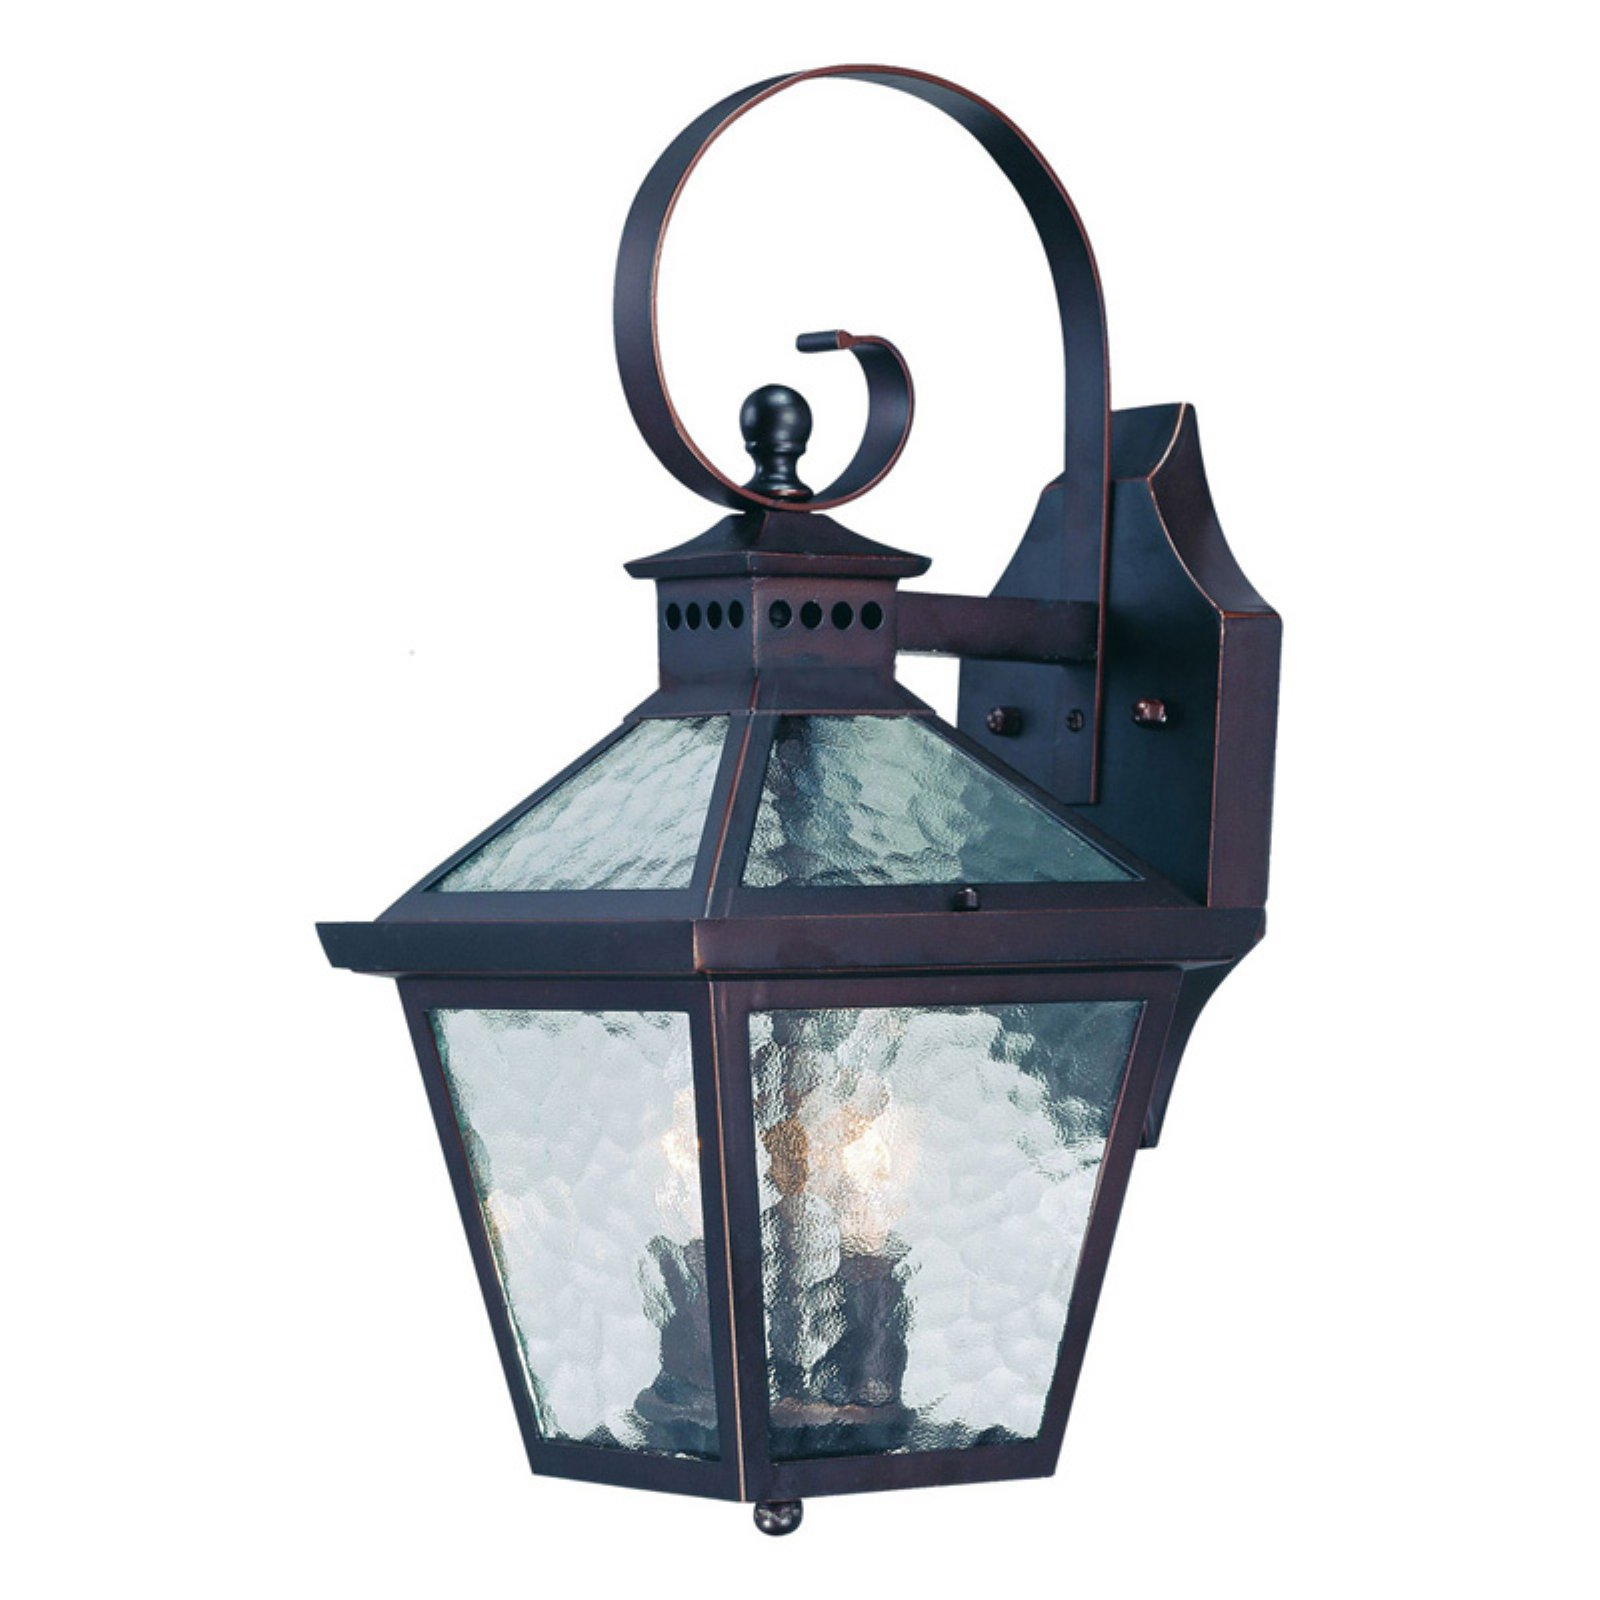 Acclaim Lighting Bay Street 7.75 in. Outdoor Wall Mount Light Fixture